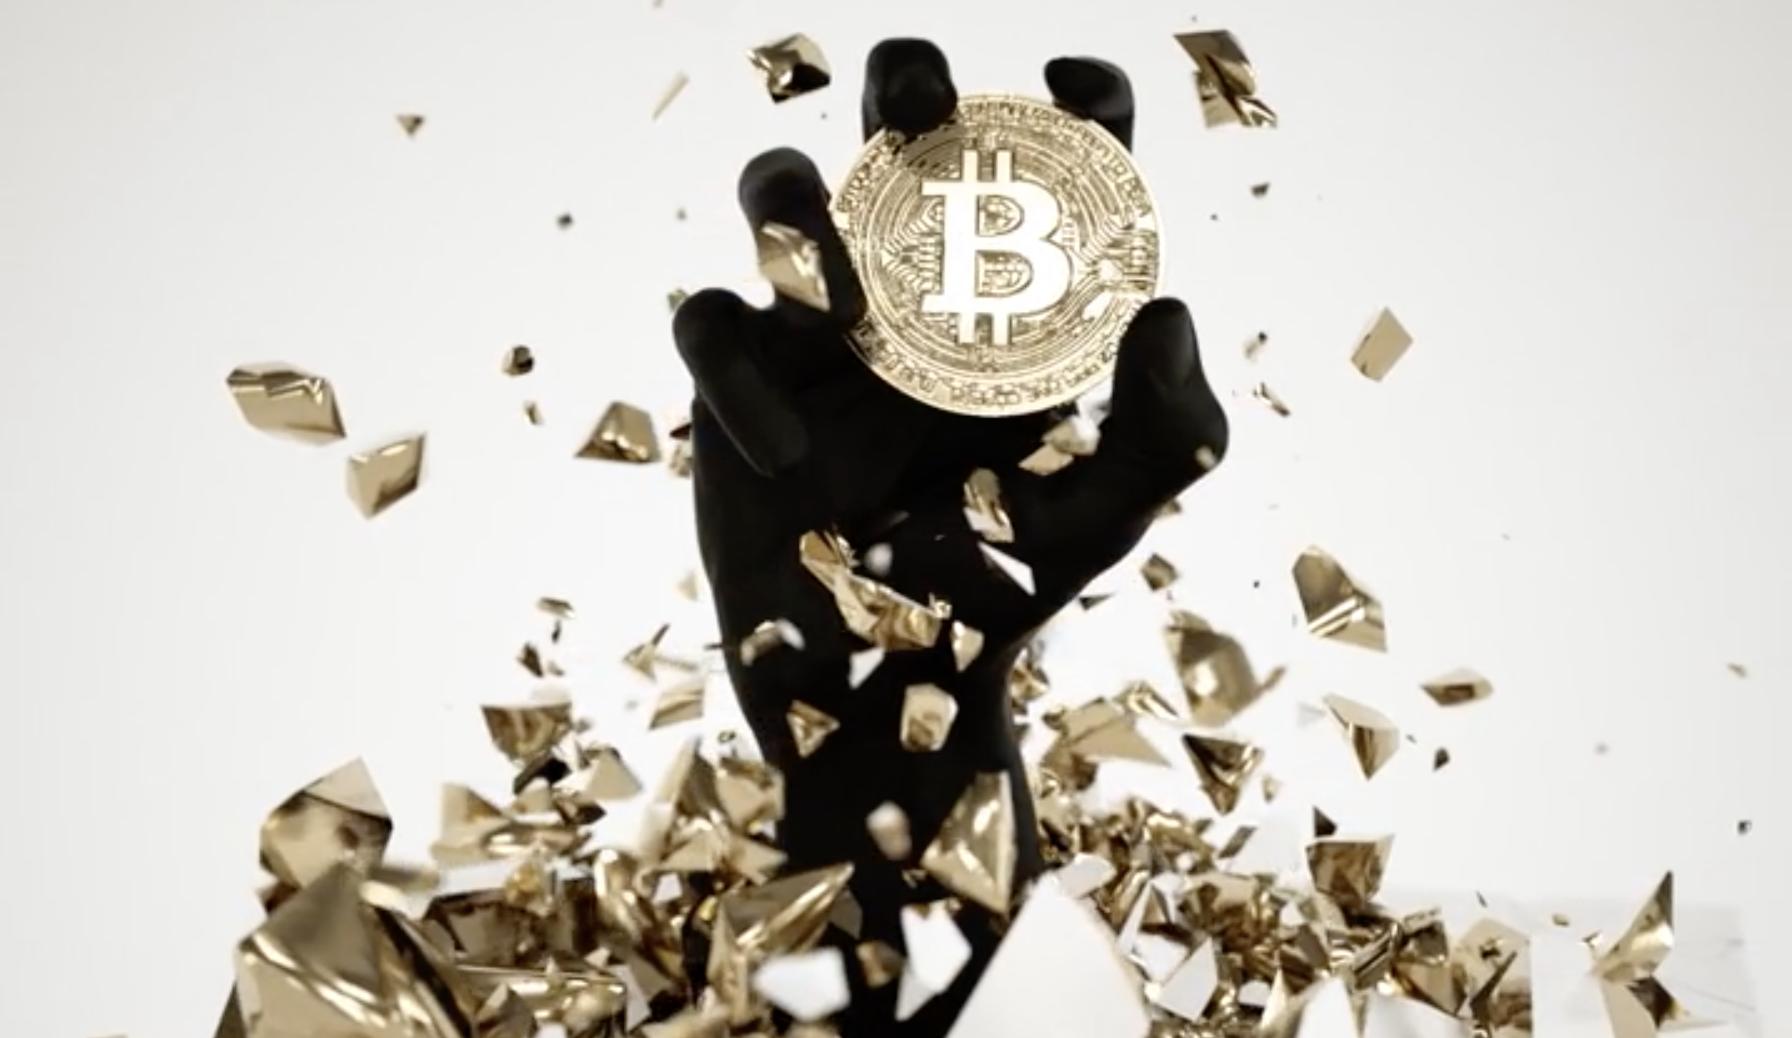 Bitcoin hodl art, Jan 2021